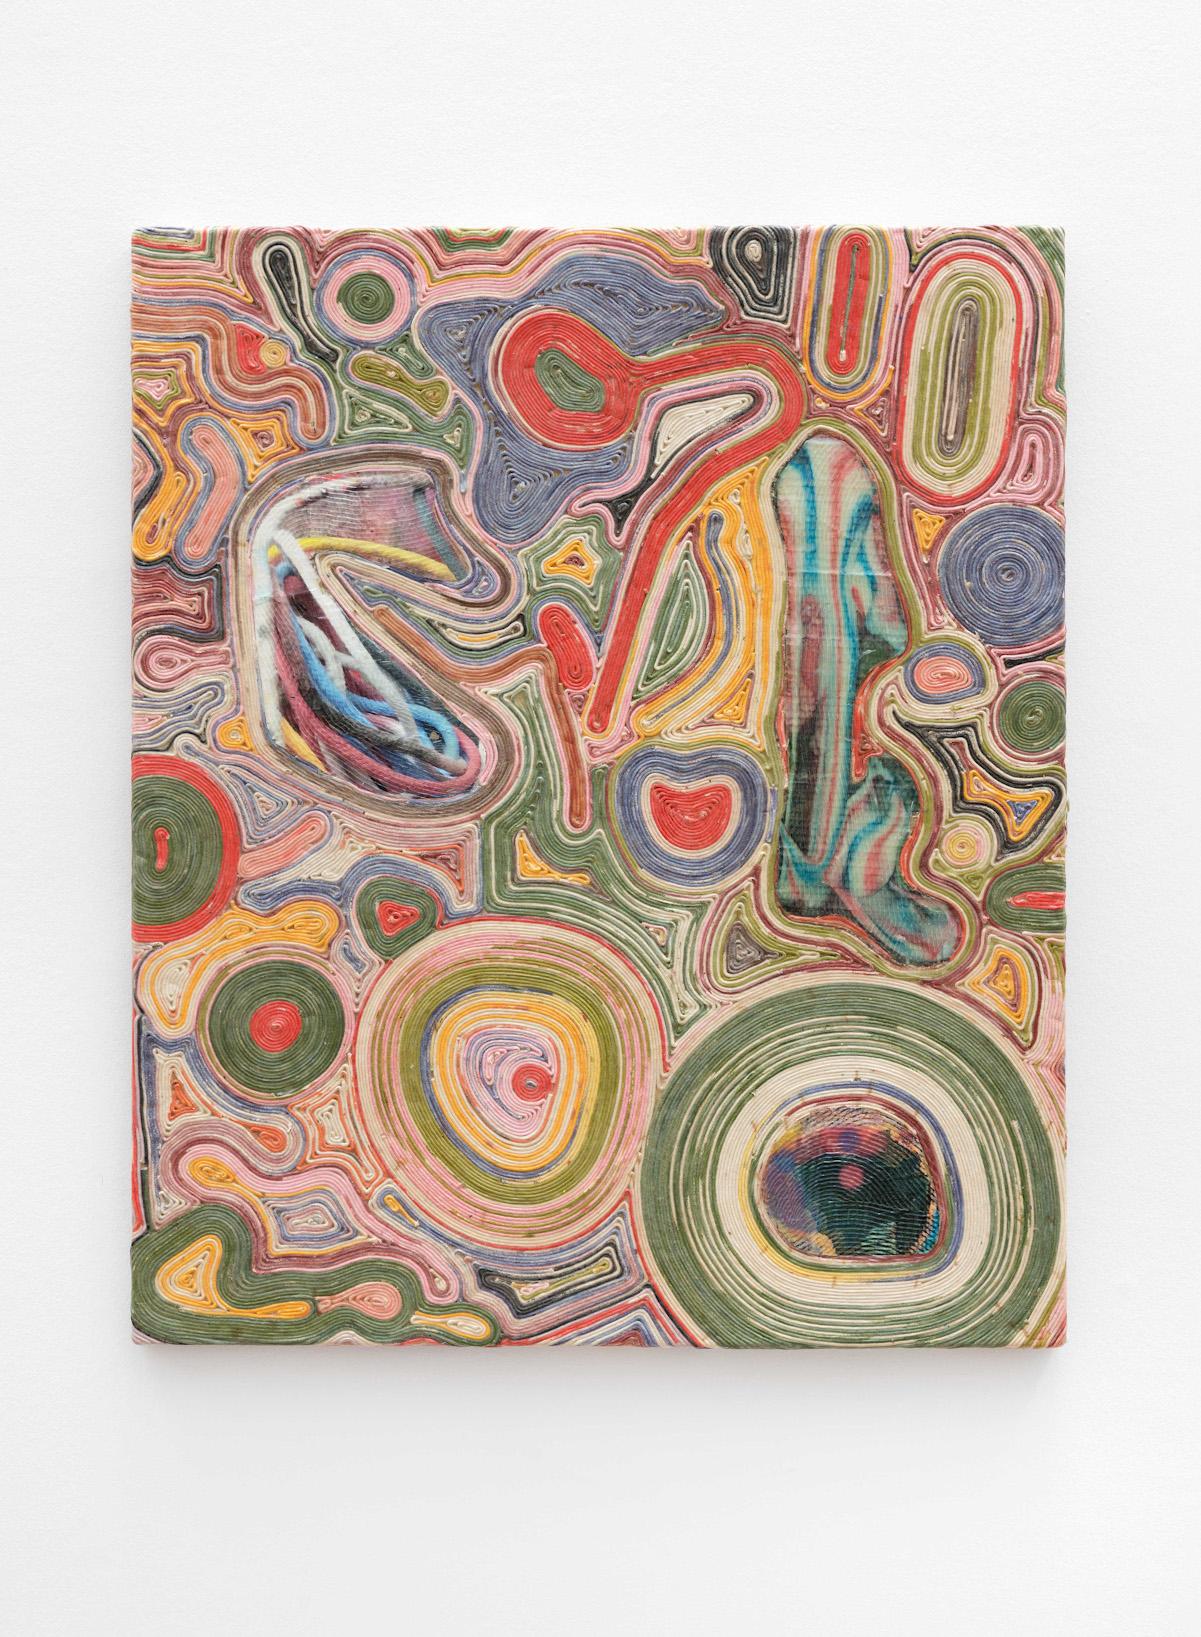 Markus Oehlen, ohne Titel, 2018  Acryl, Papier, Kordel auf Holz  120 x 100 x 5 cm  Foto. Wolfgang Günzel